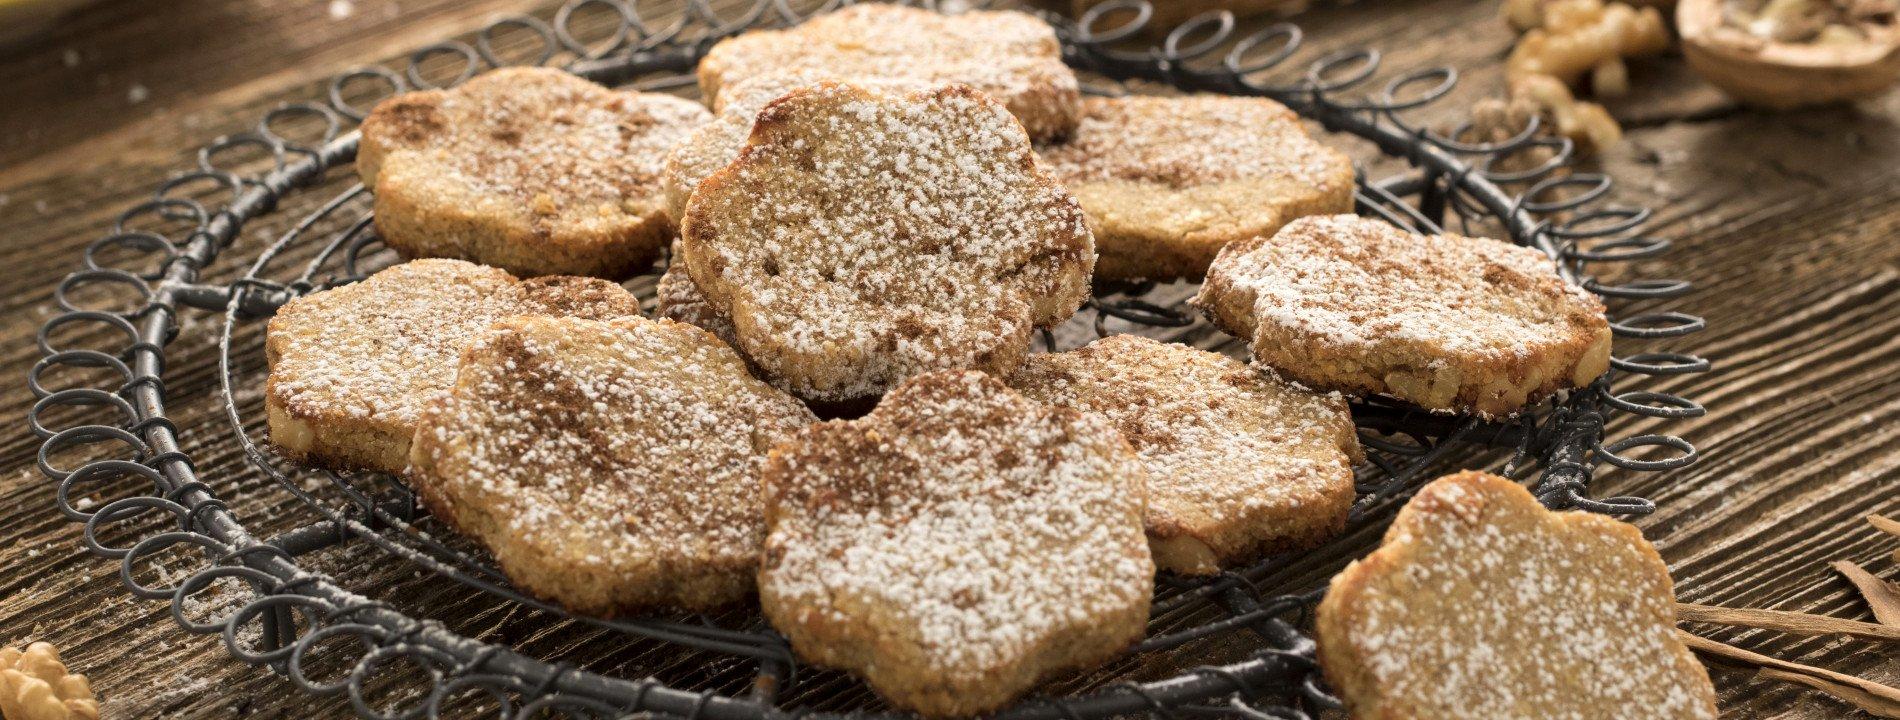 Potato Wafers with Walnuts and Cinnamon